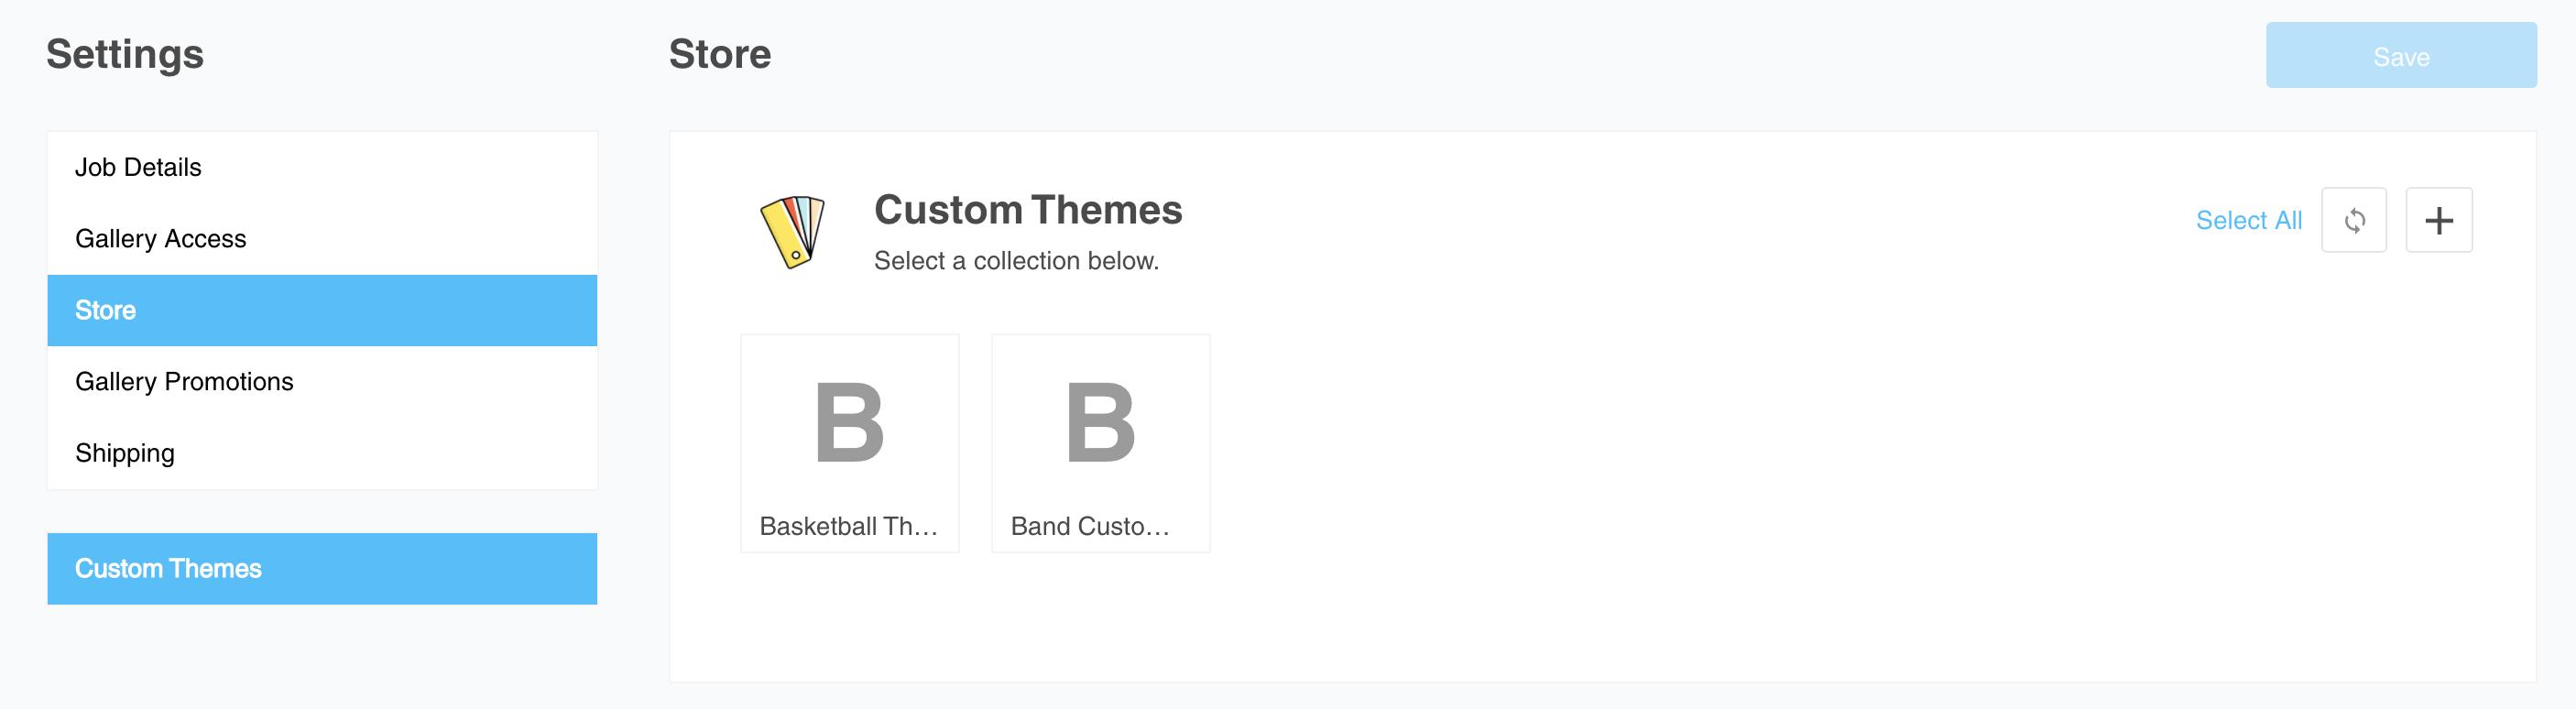 custom themes list